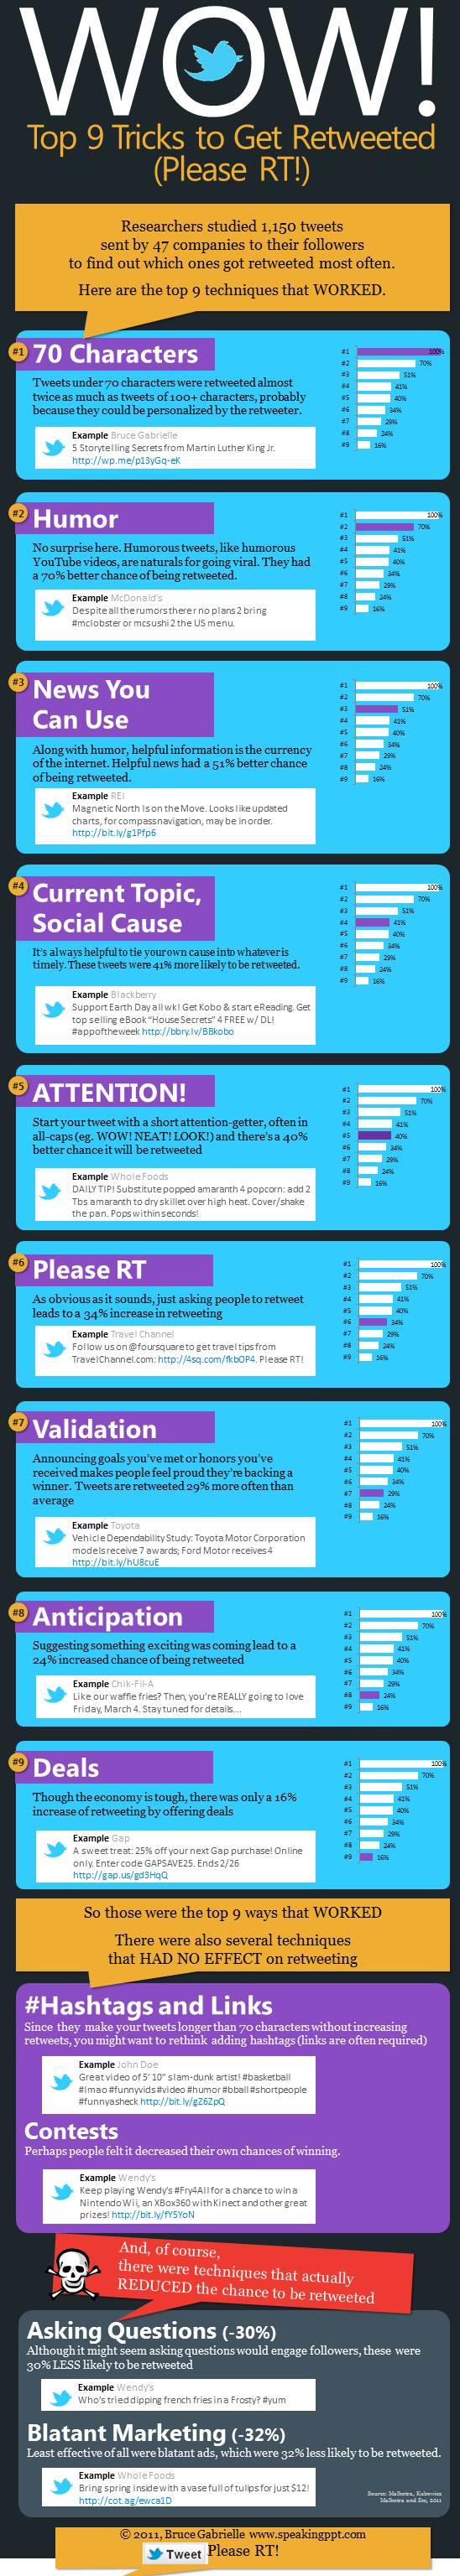 wow top 9 tricks to get retweeted please rt speaking